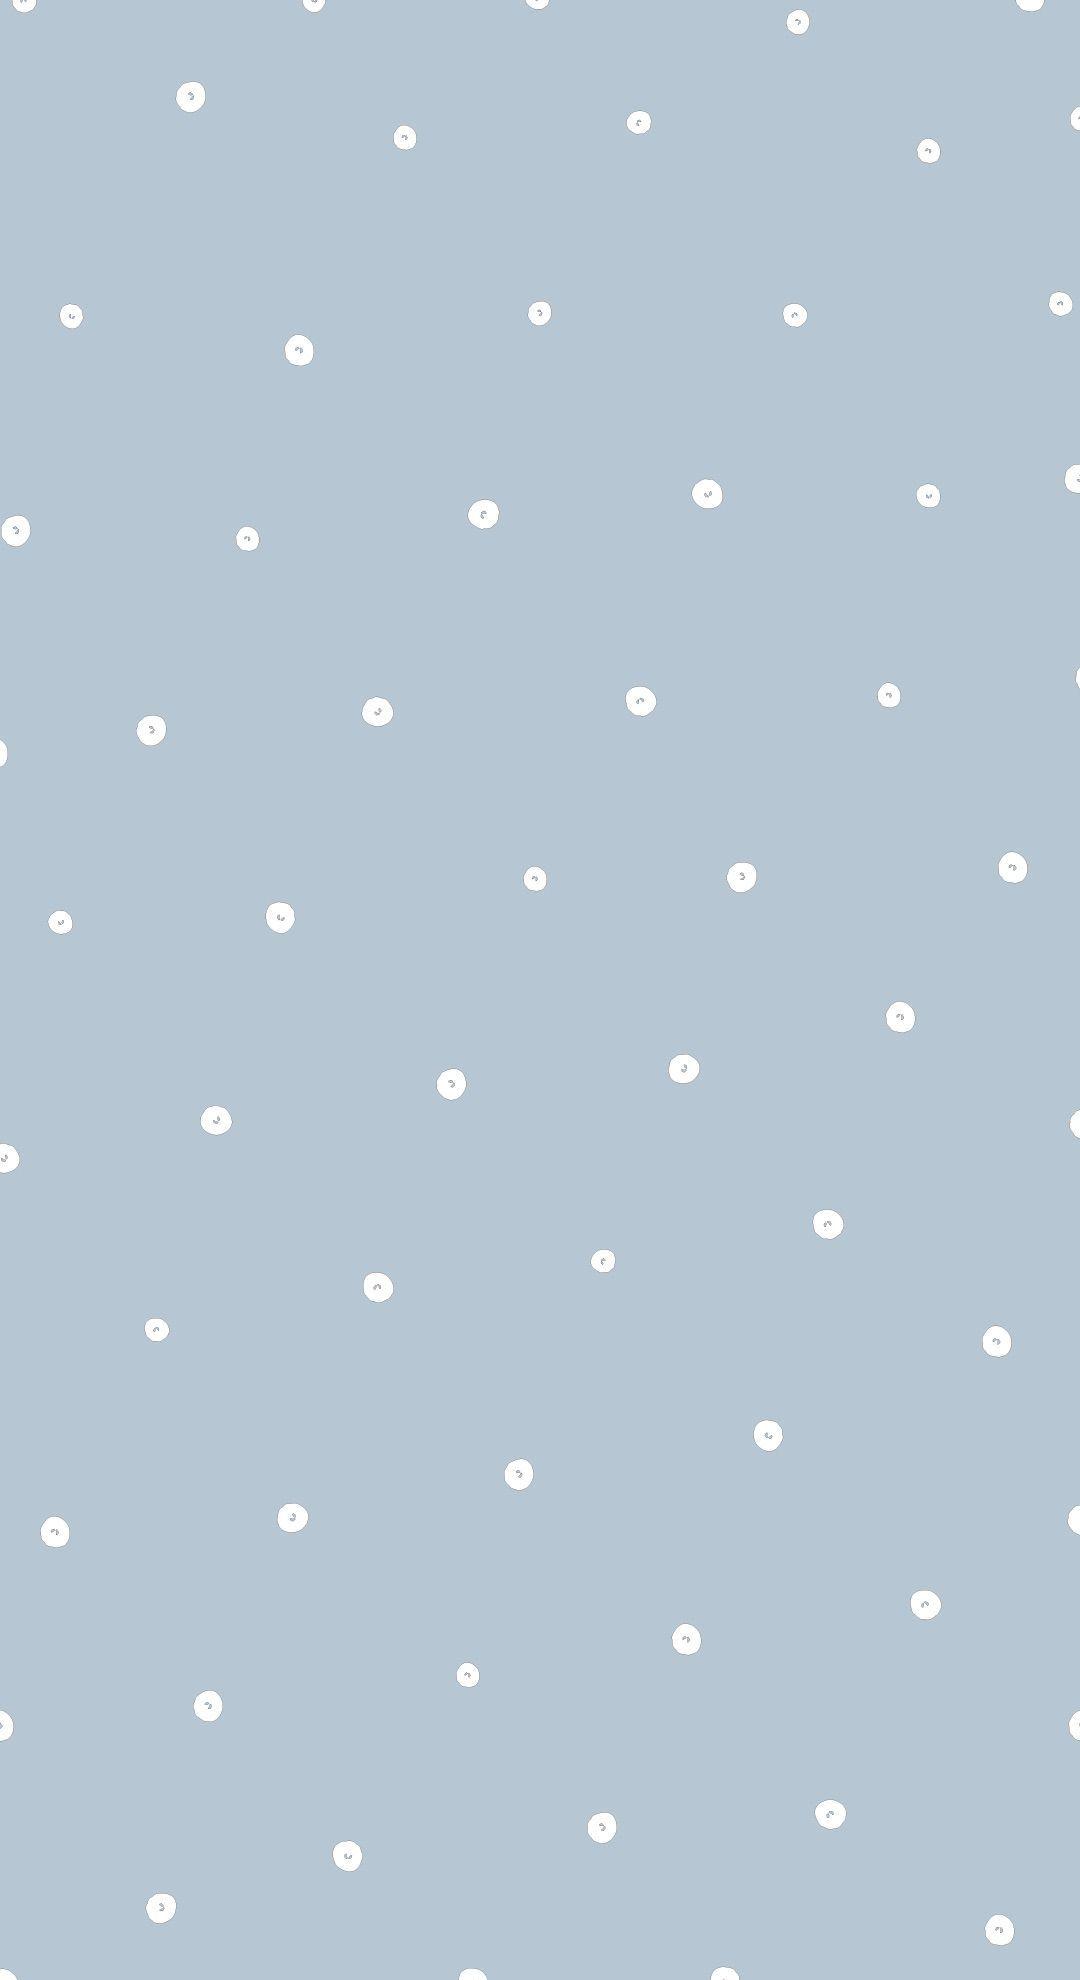 Pin By John W Sc On Ipad Pro Wallpaper 12 9 Iphone Background Wallpaper Phone Wallpaper Boho Cute Patterns Wallpaper